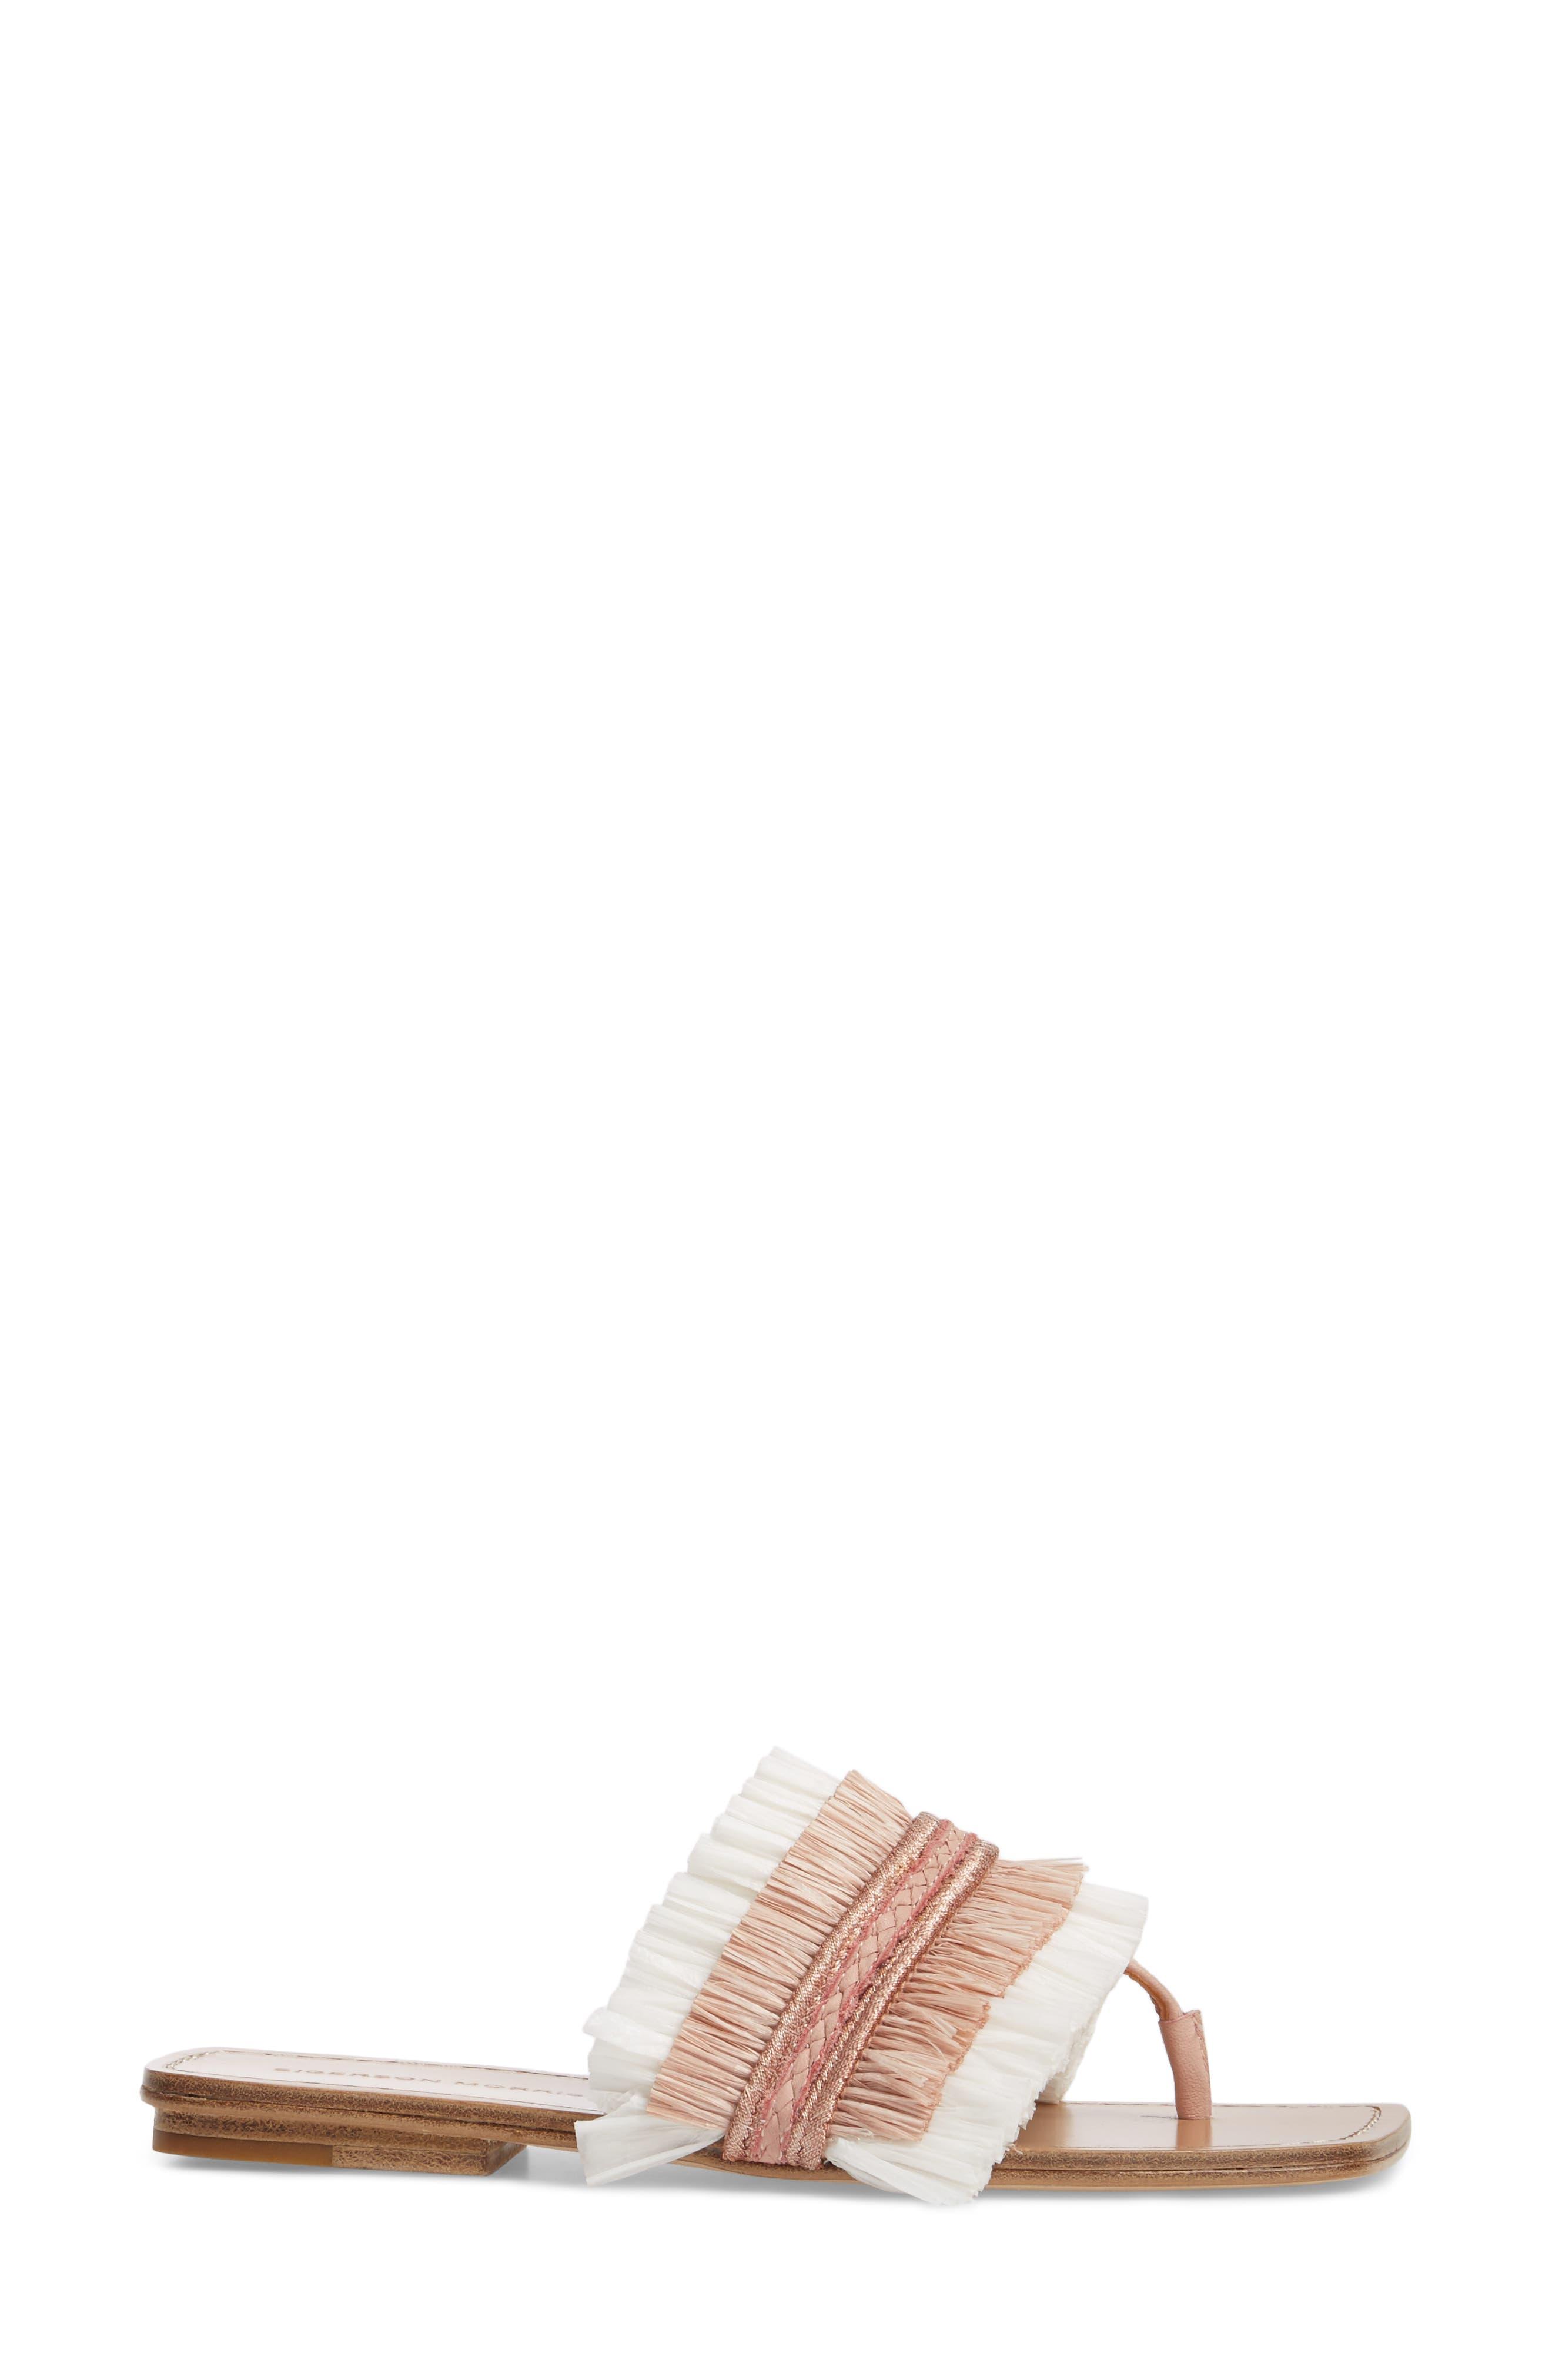 Woven Sandal,                             Alternate thumbnail 3, color,                             697